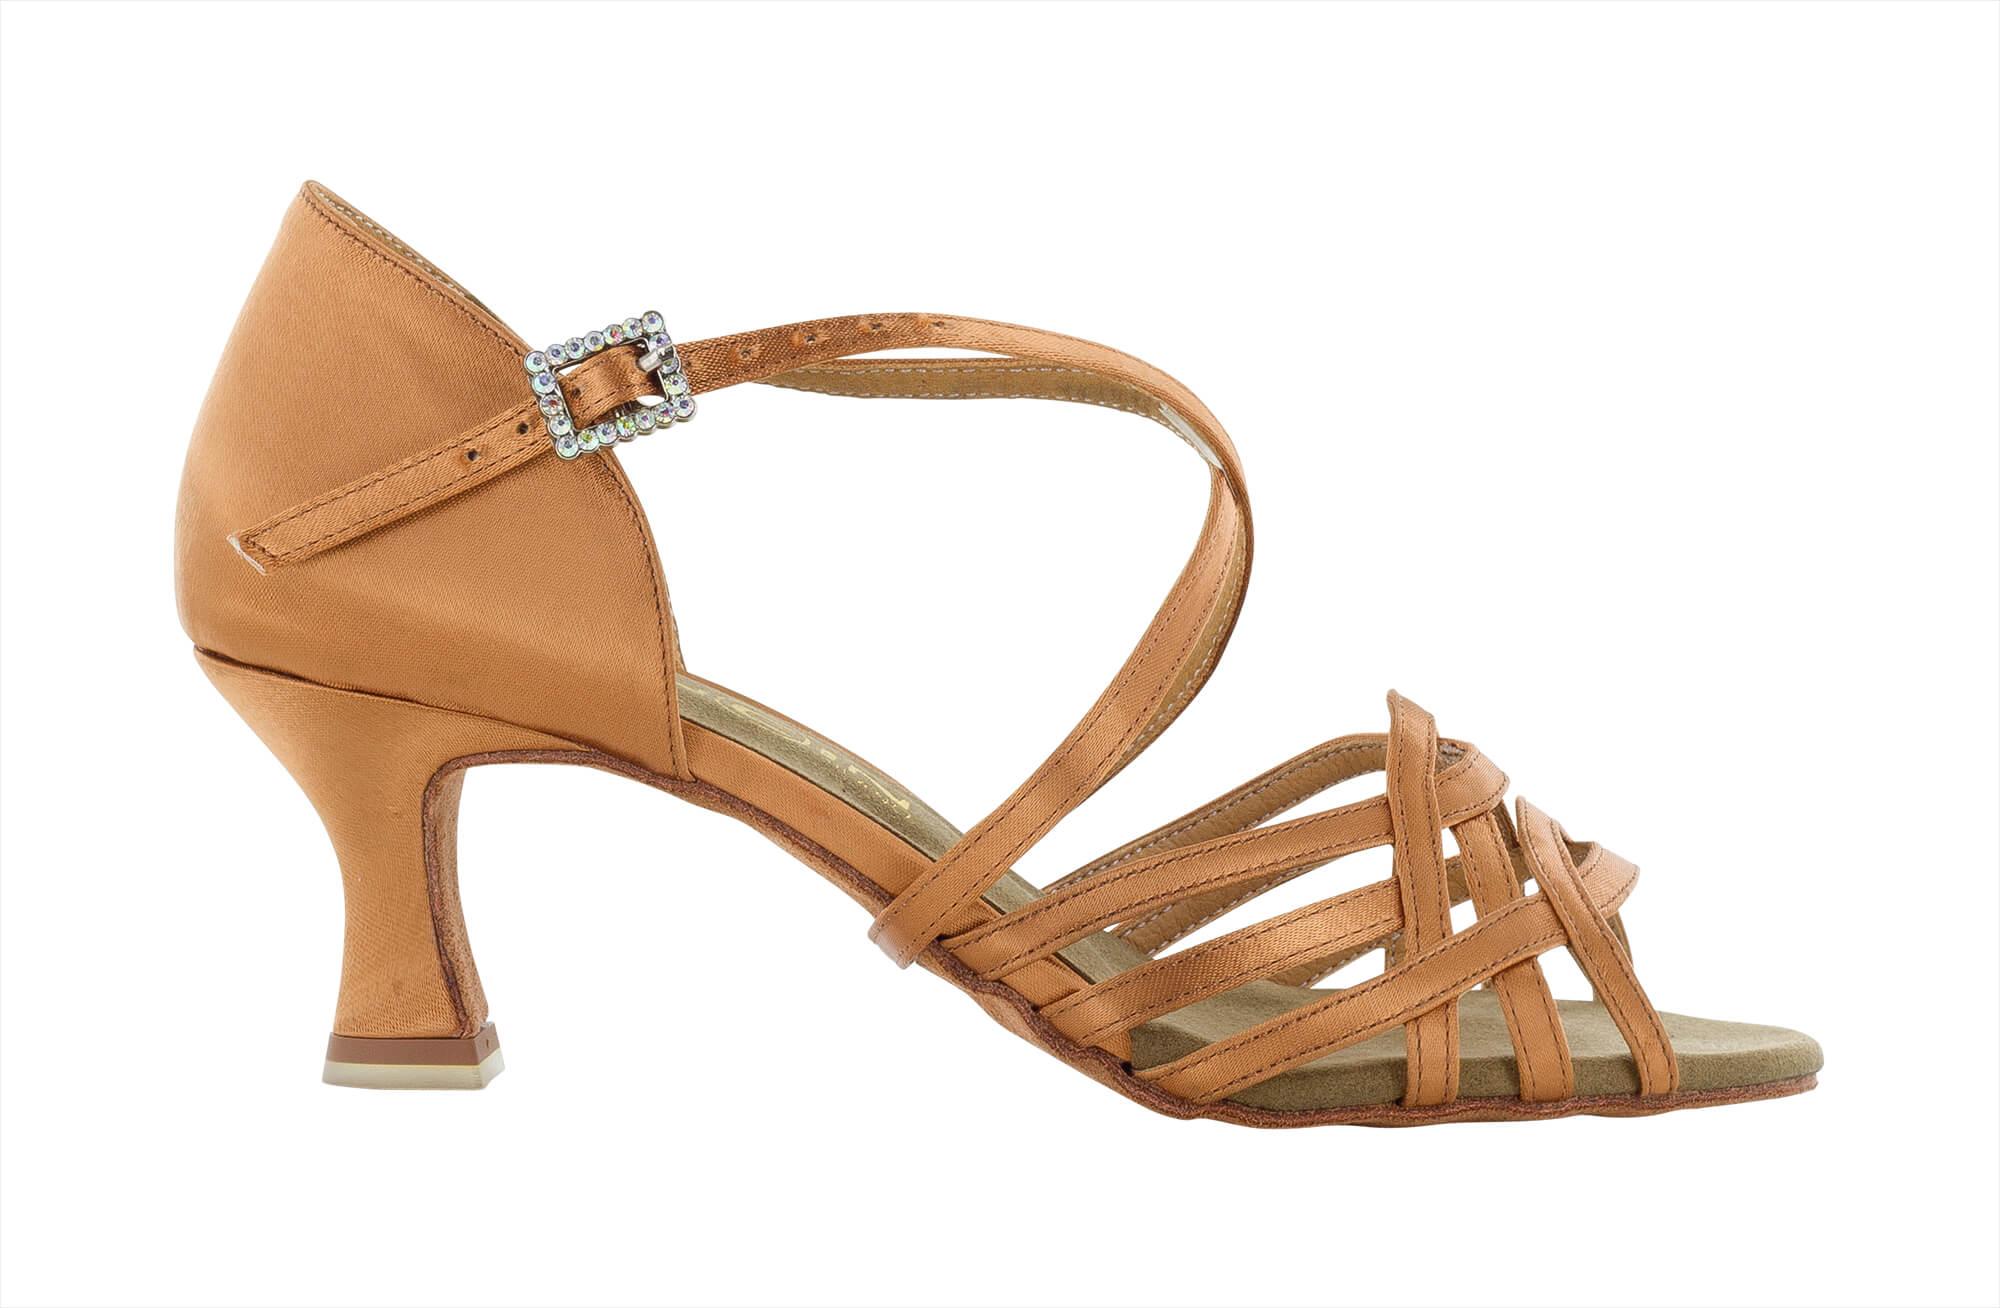 Zapato de baile Danc'in en Raso de Tacón 5'5cm